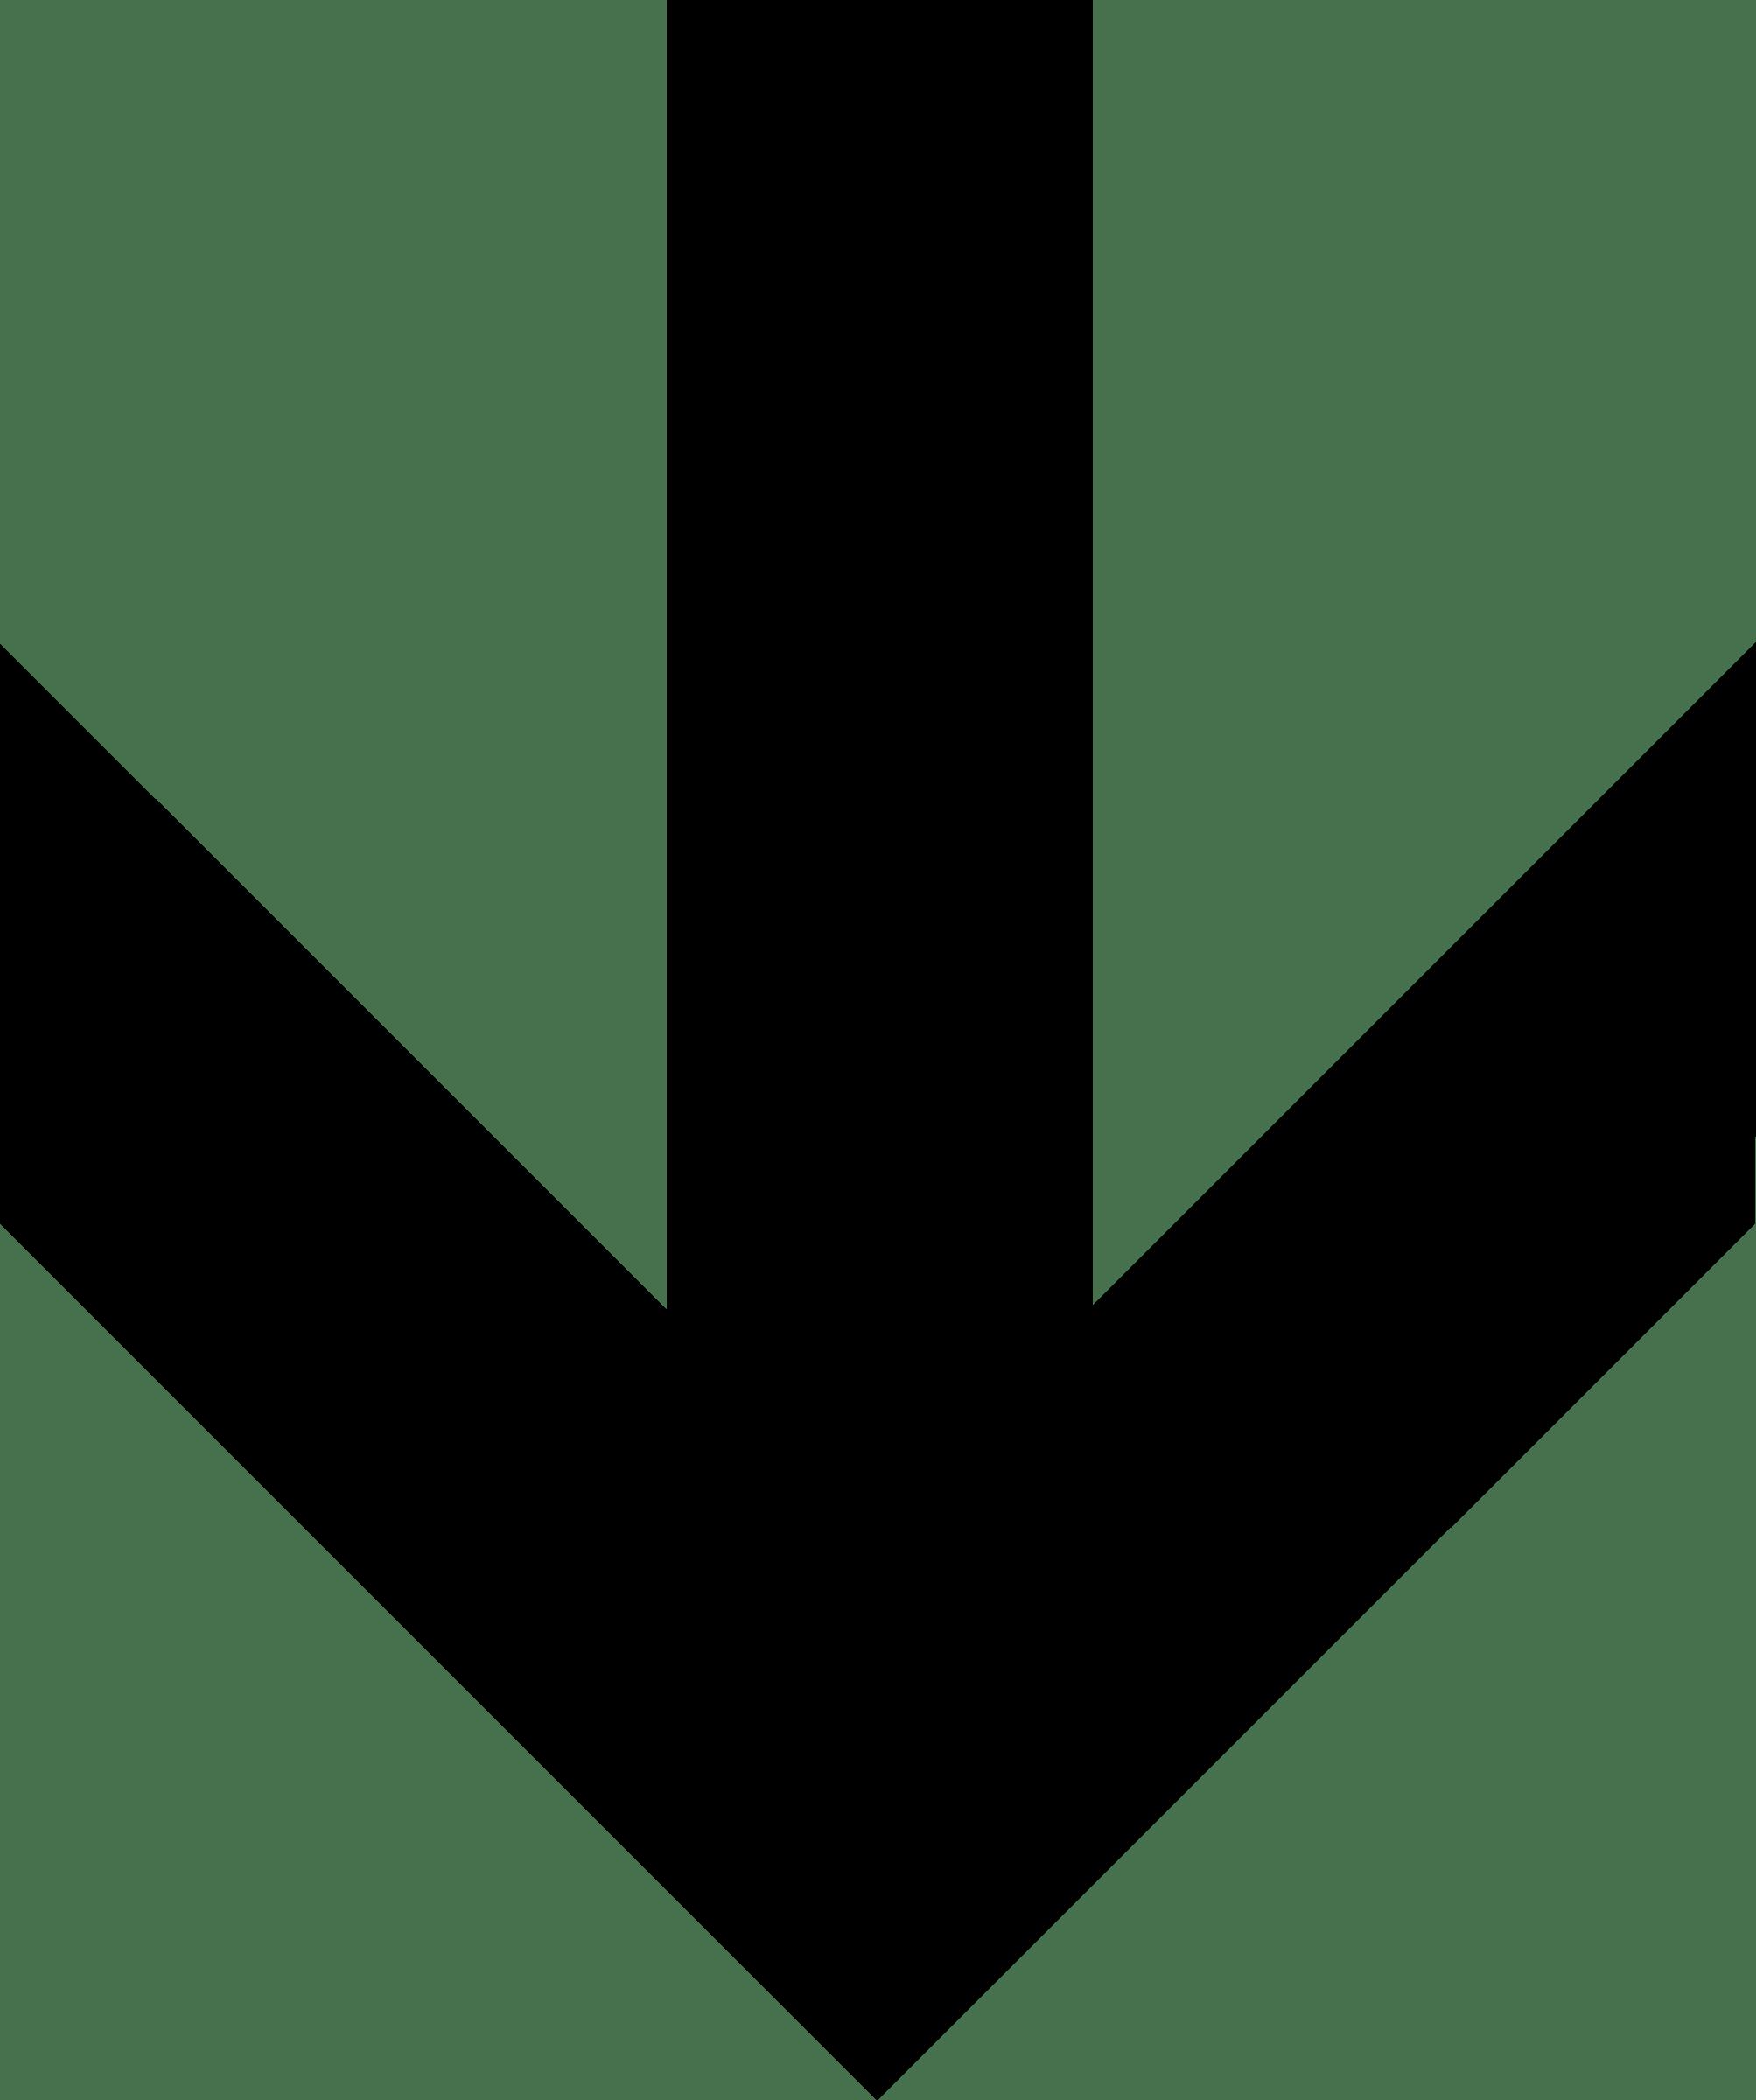 Bold Arrow Down transparent PNG.